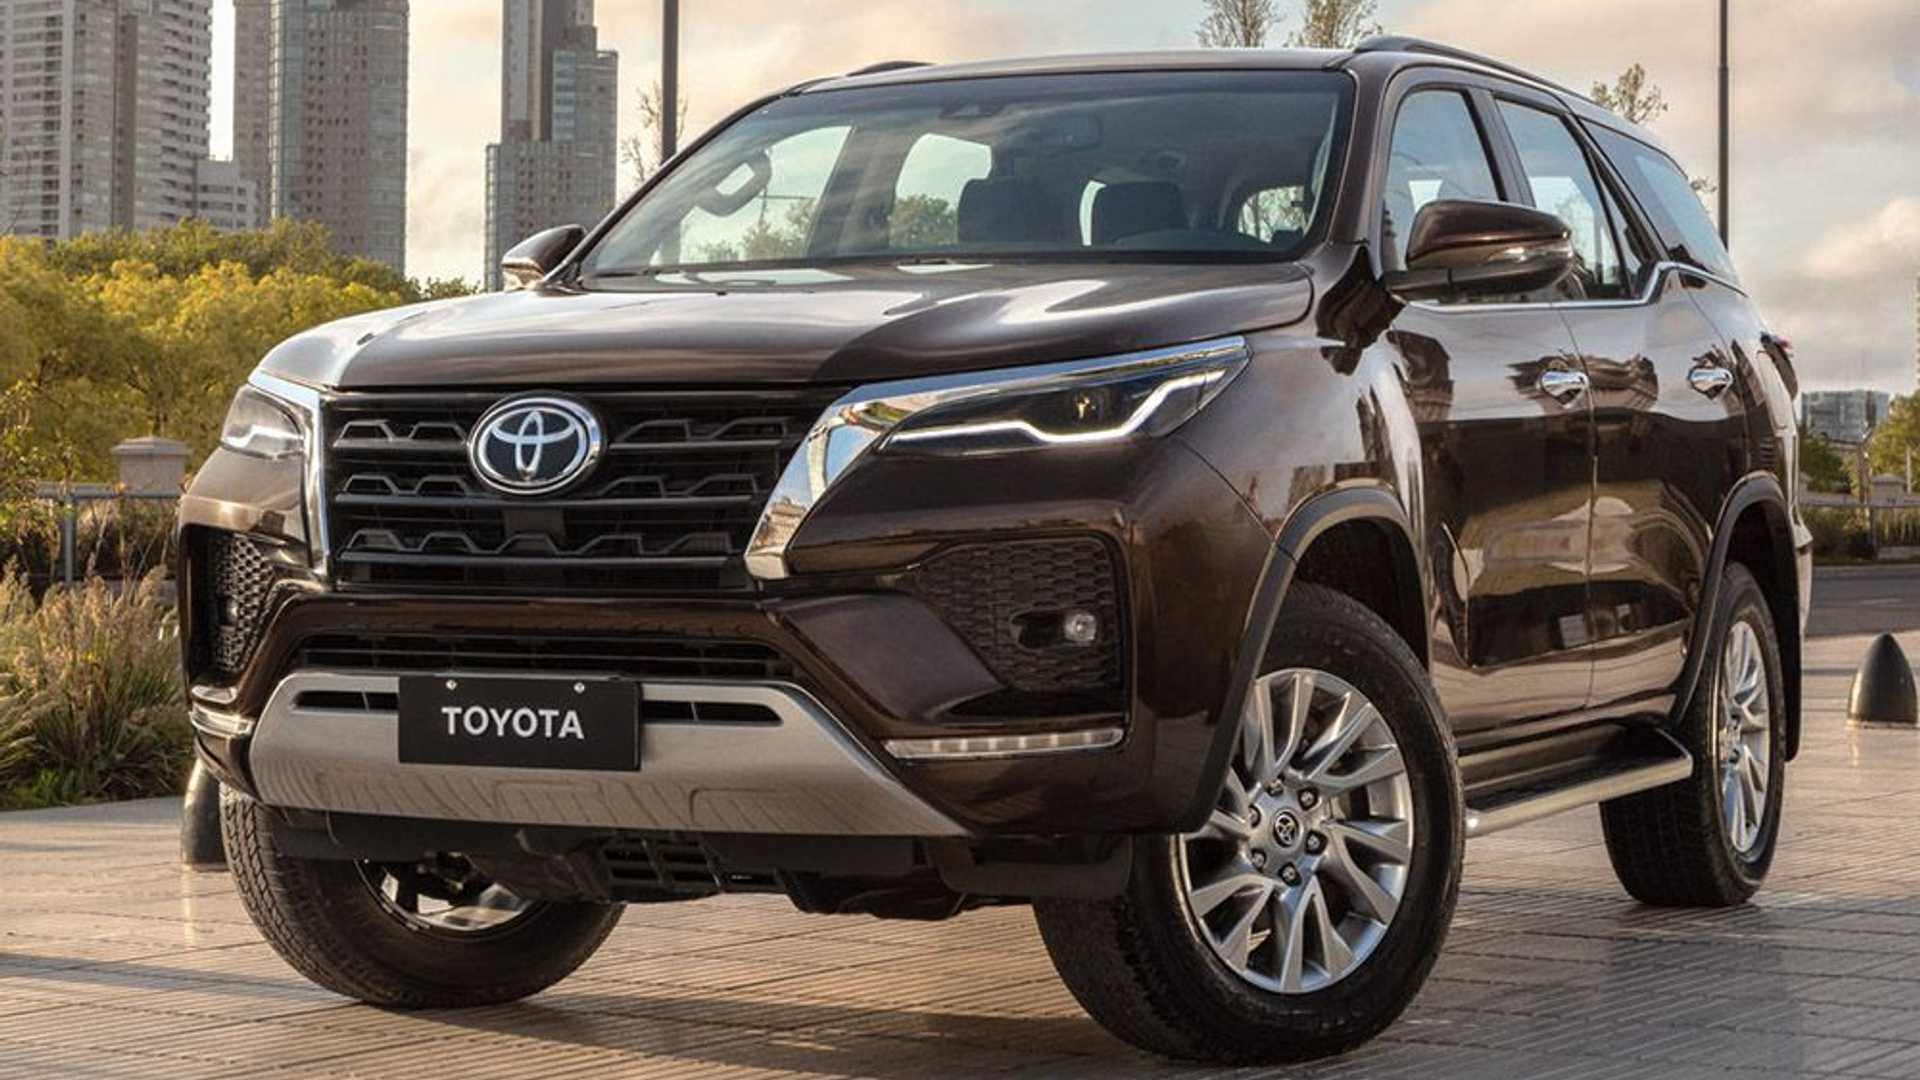 Toyota Sw4 2021 Recebe O Primeiro Aumento Apos O Lancamento Mundo Do Automovel Para Pcd